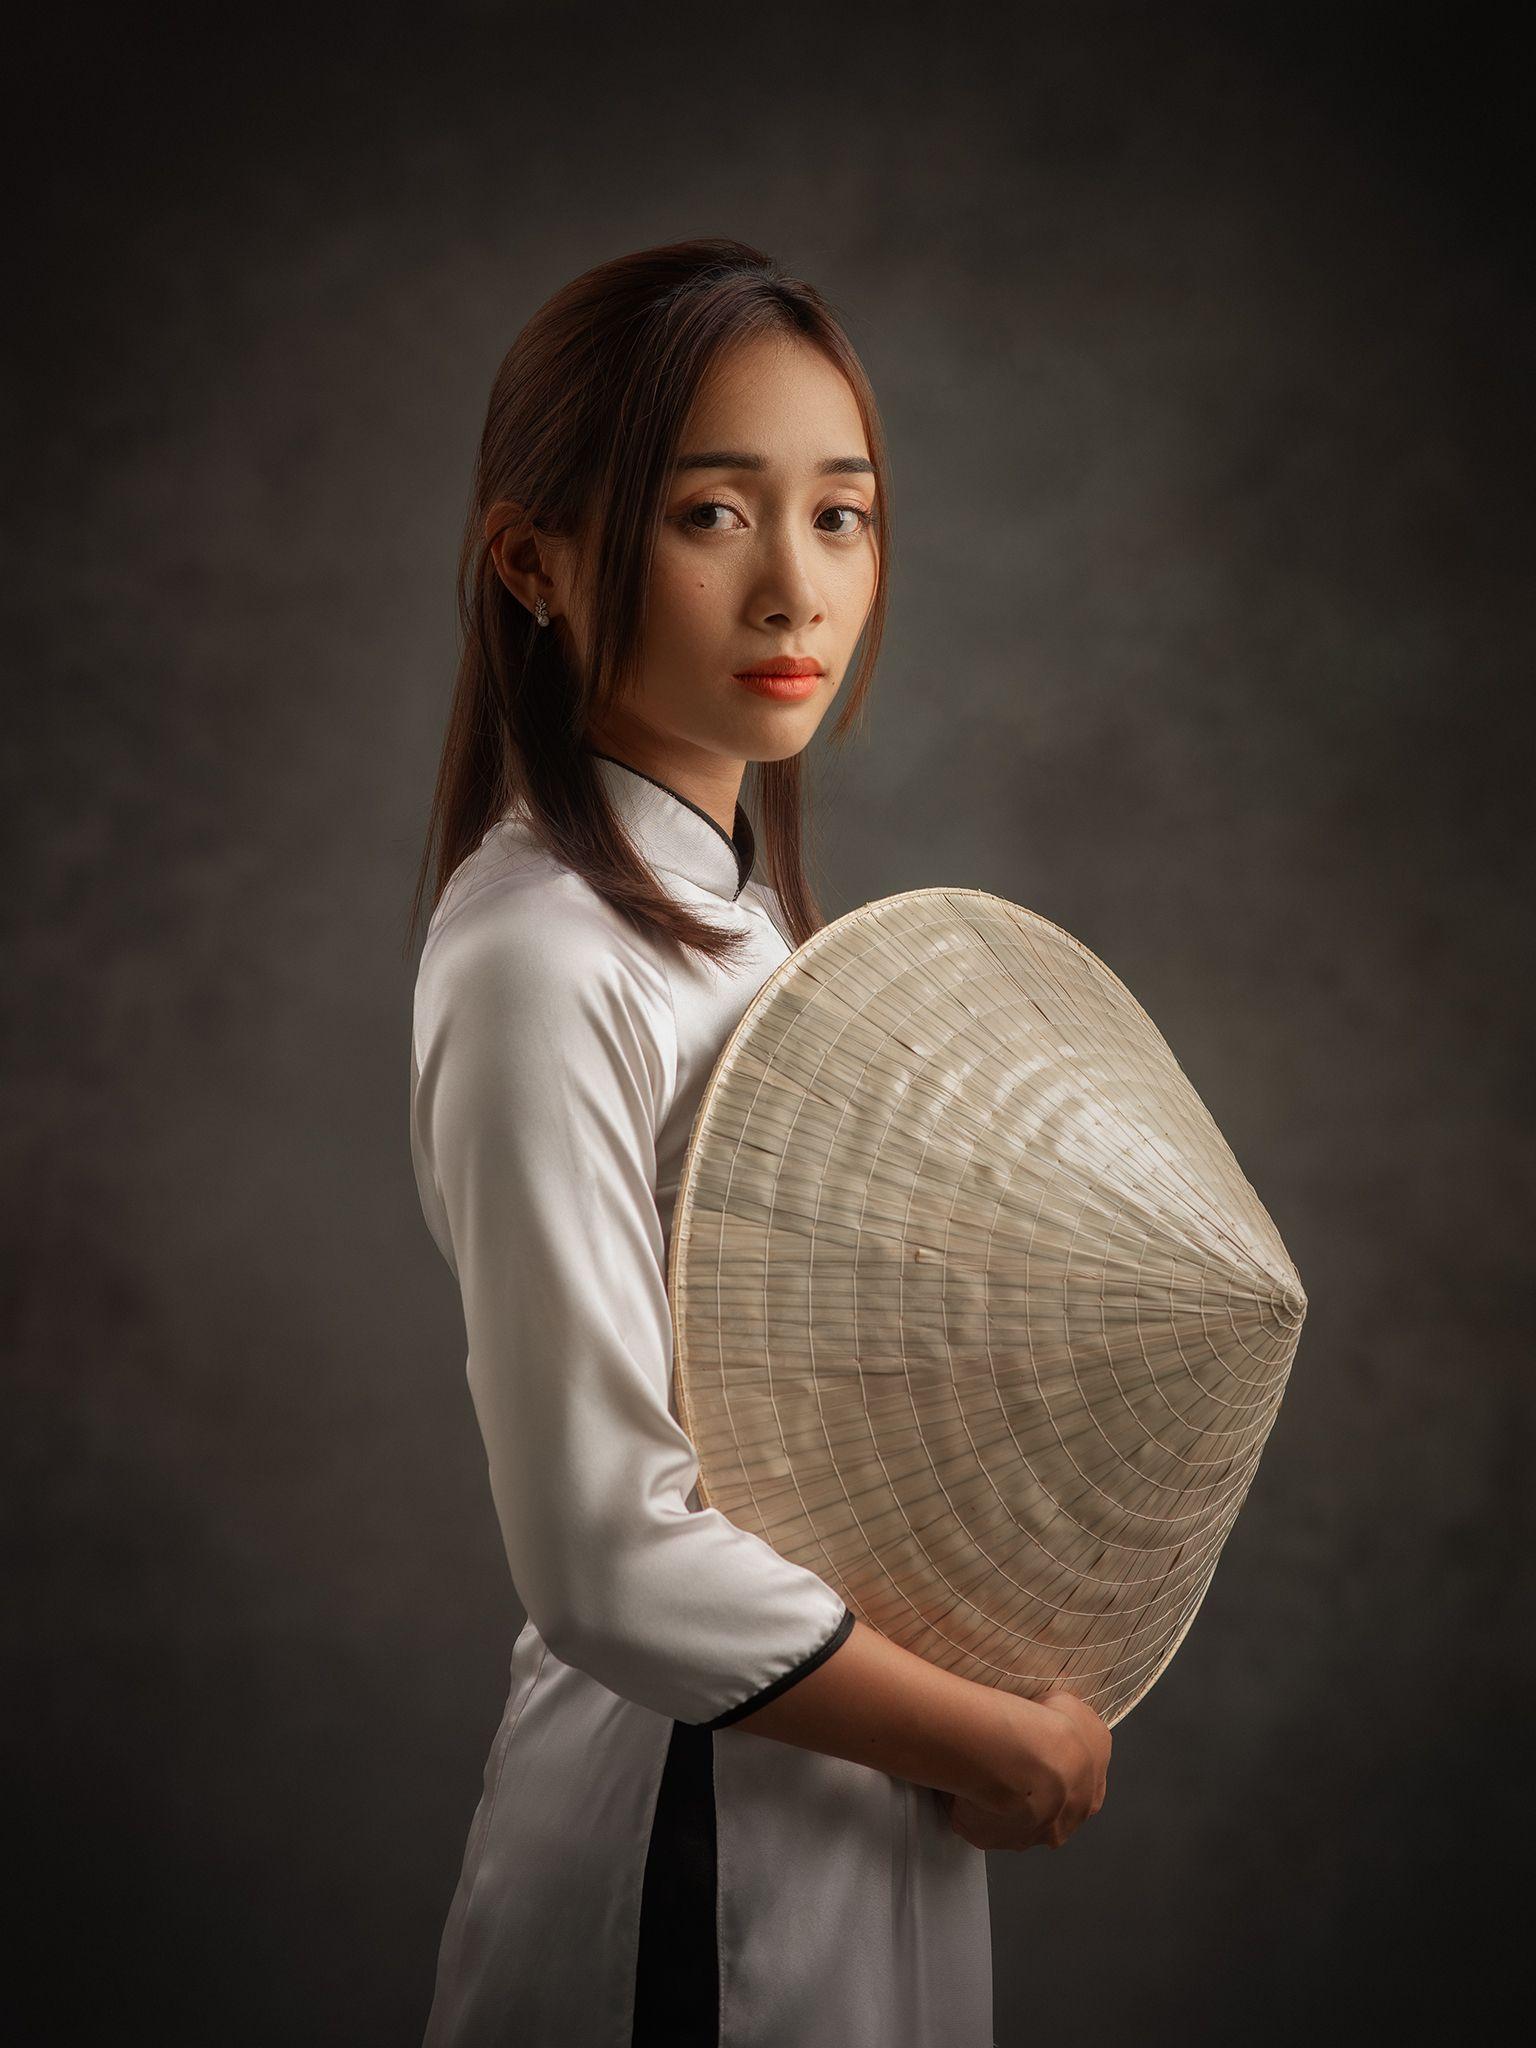 portrait, woman, female, beauty, face, lady, vietnamese, vietnam, asian, girl, studio, white, dress, hat, traditional, Hoang Viet Nguyen